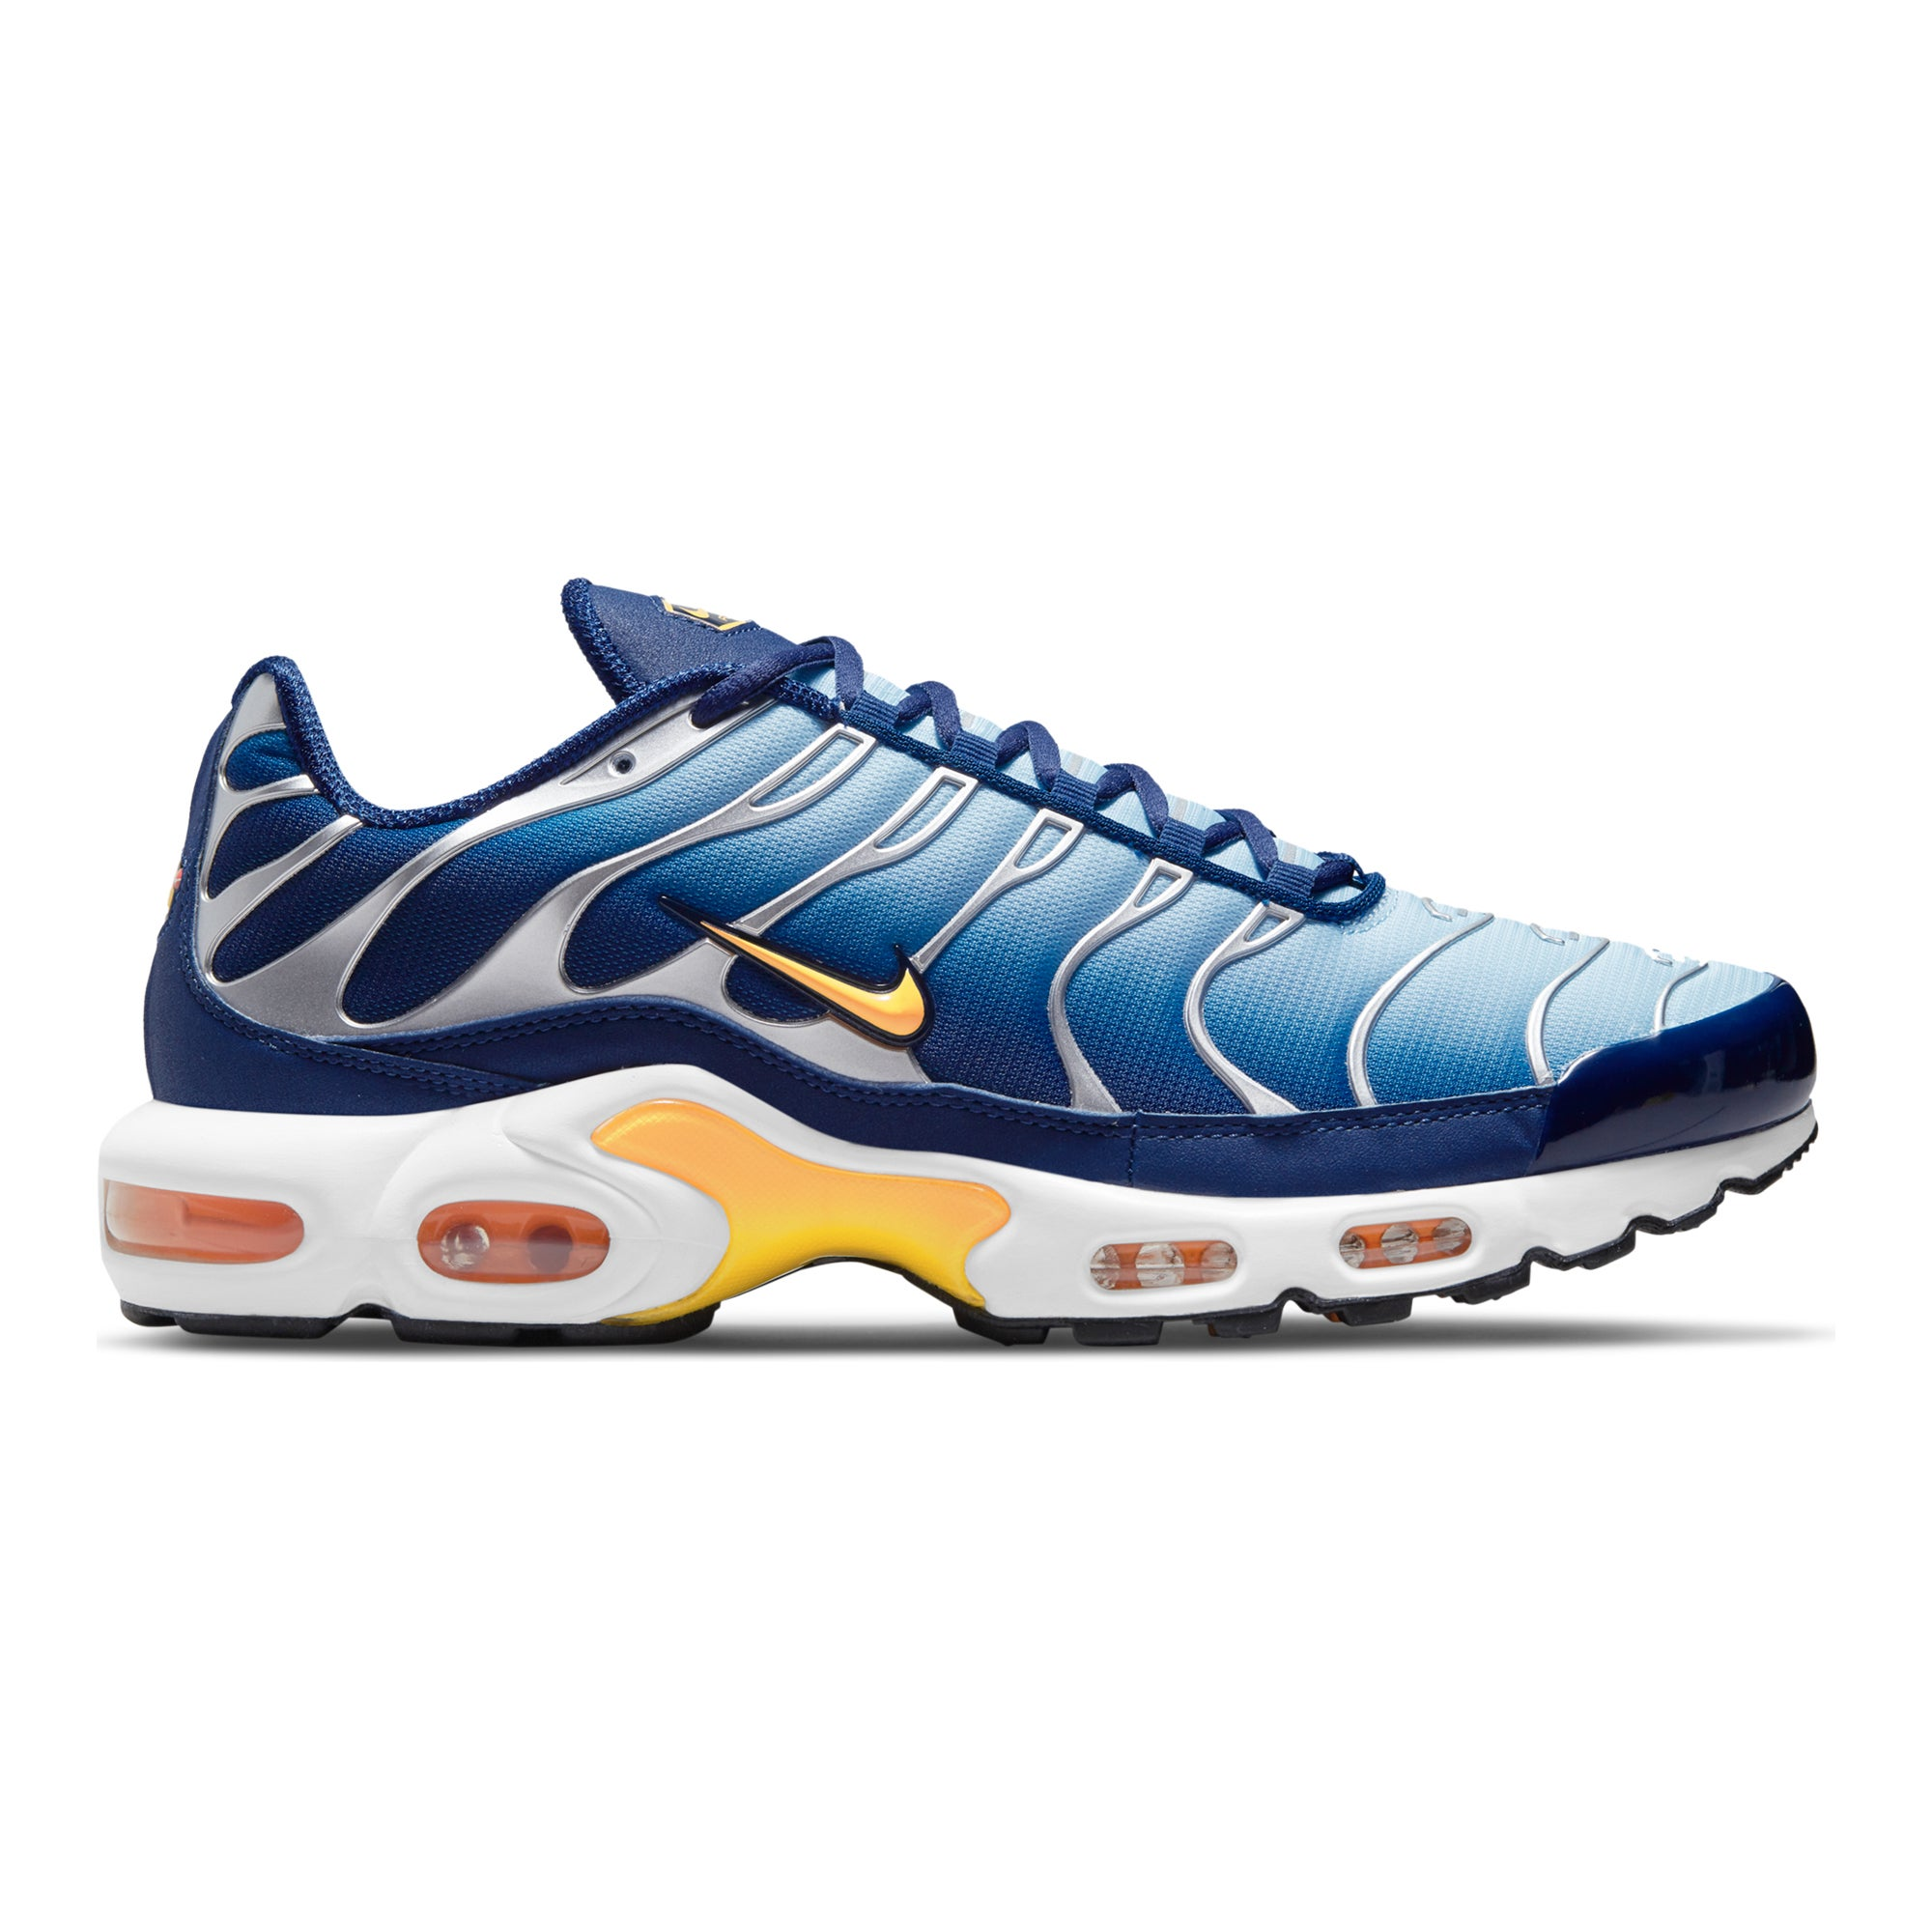 Nike Tuned 1 Shoes